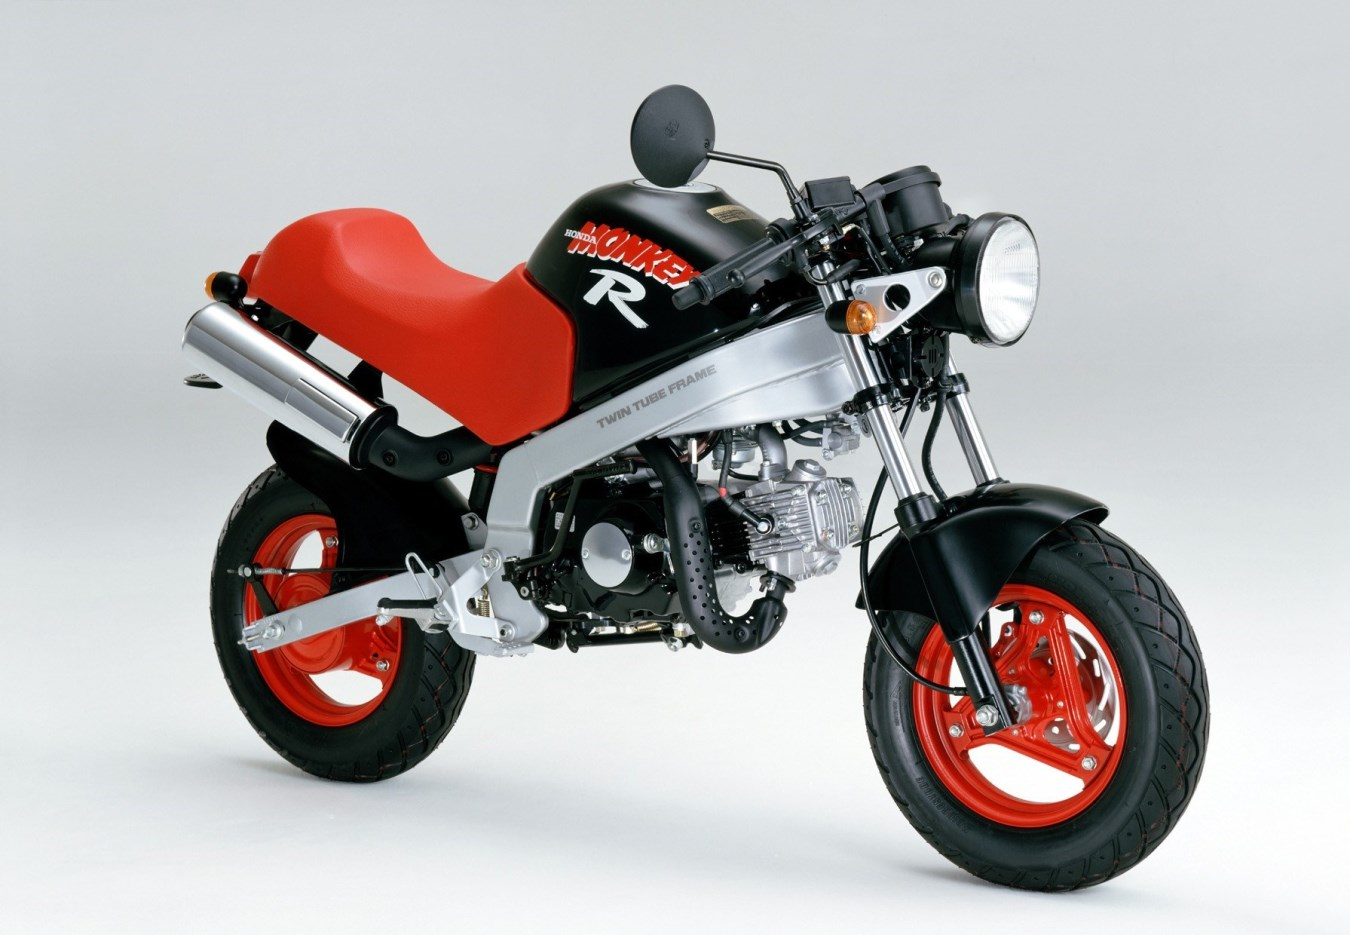 "1987 - A-AB22, גרסת R עם שלדת אלומיניום, בולם יחיד, בלם דיסק קדמי, חישוקי ""10 ועיצוב ספורטיבי"